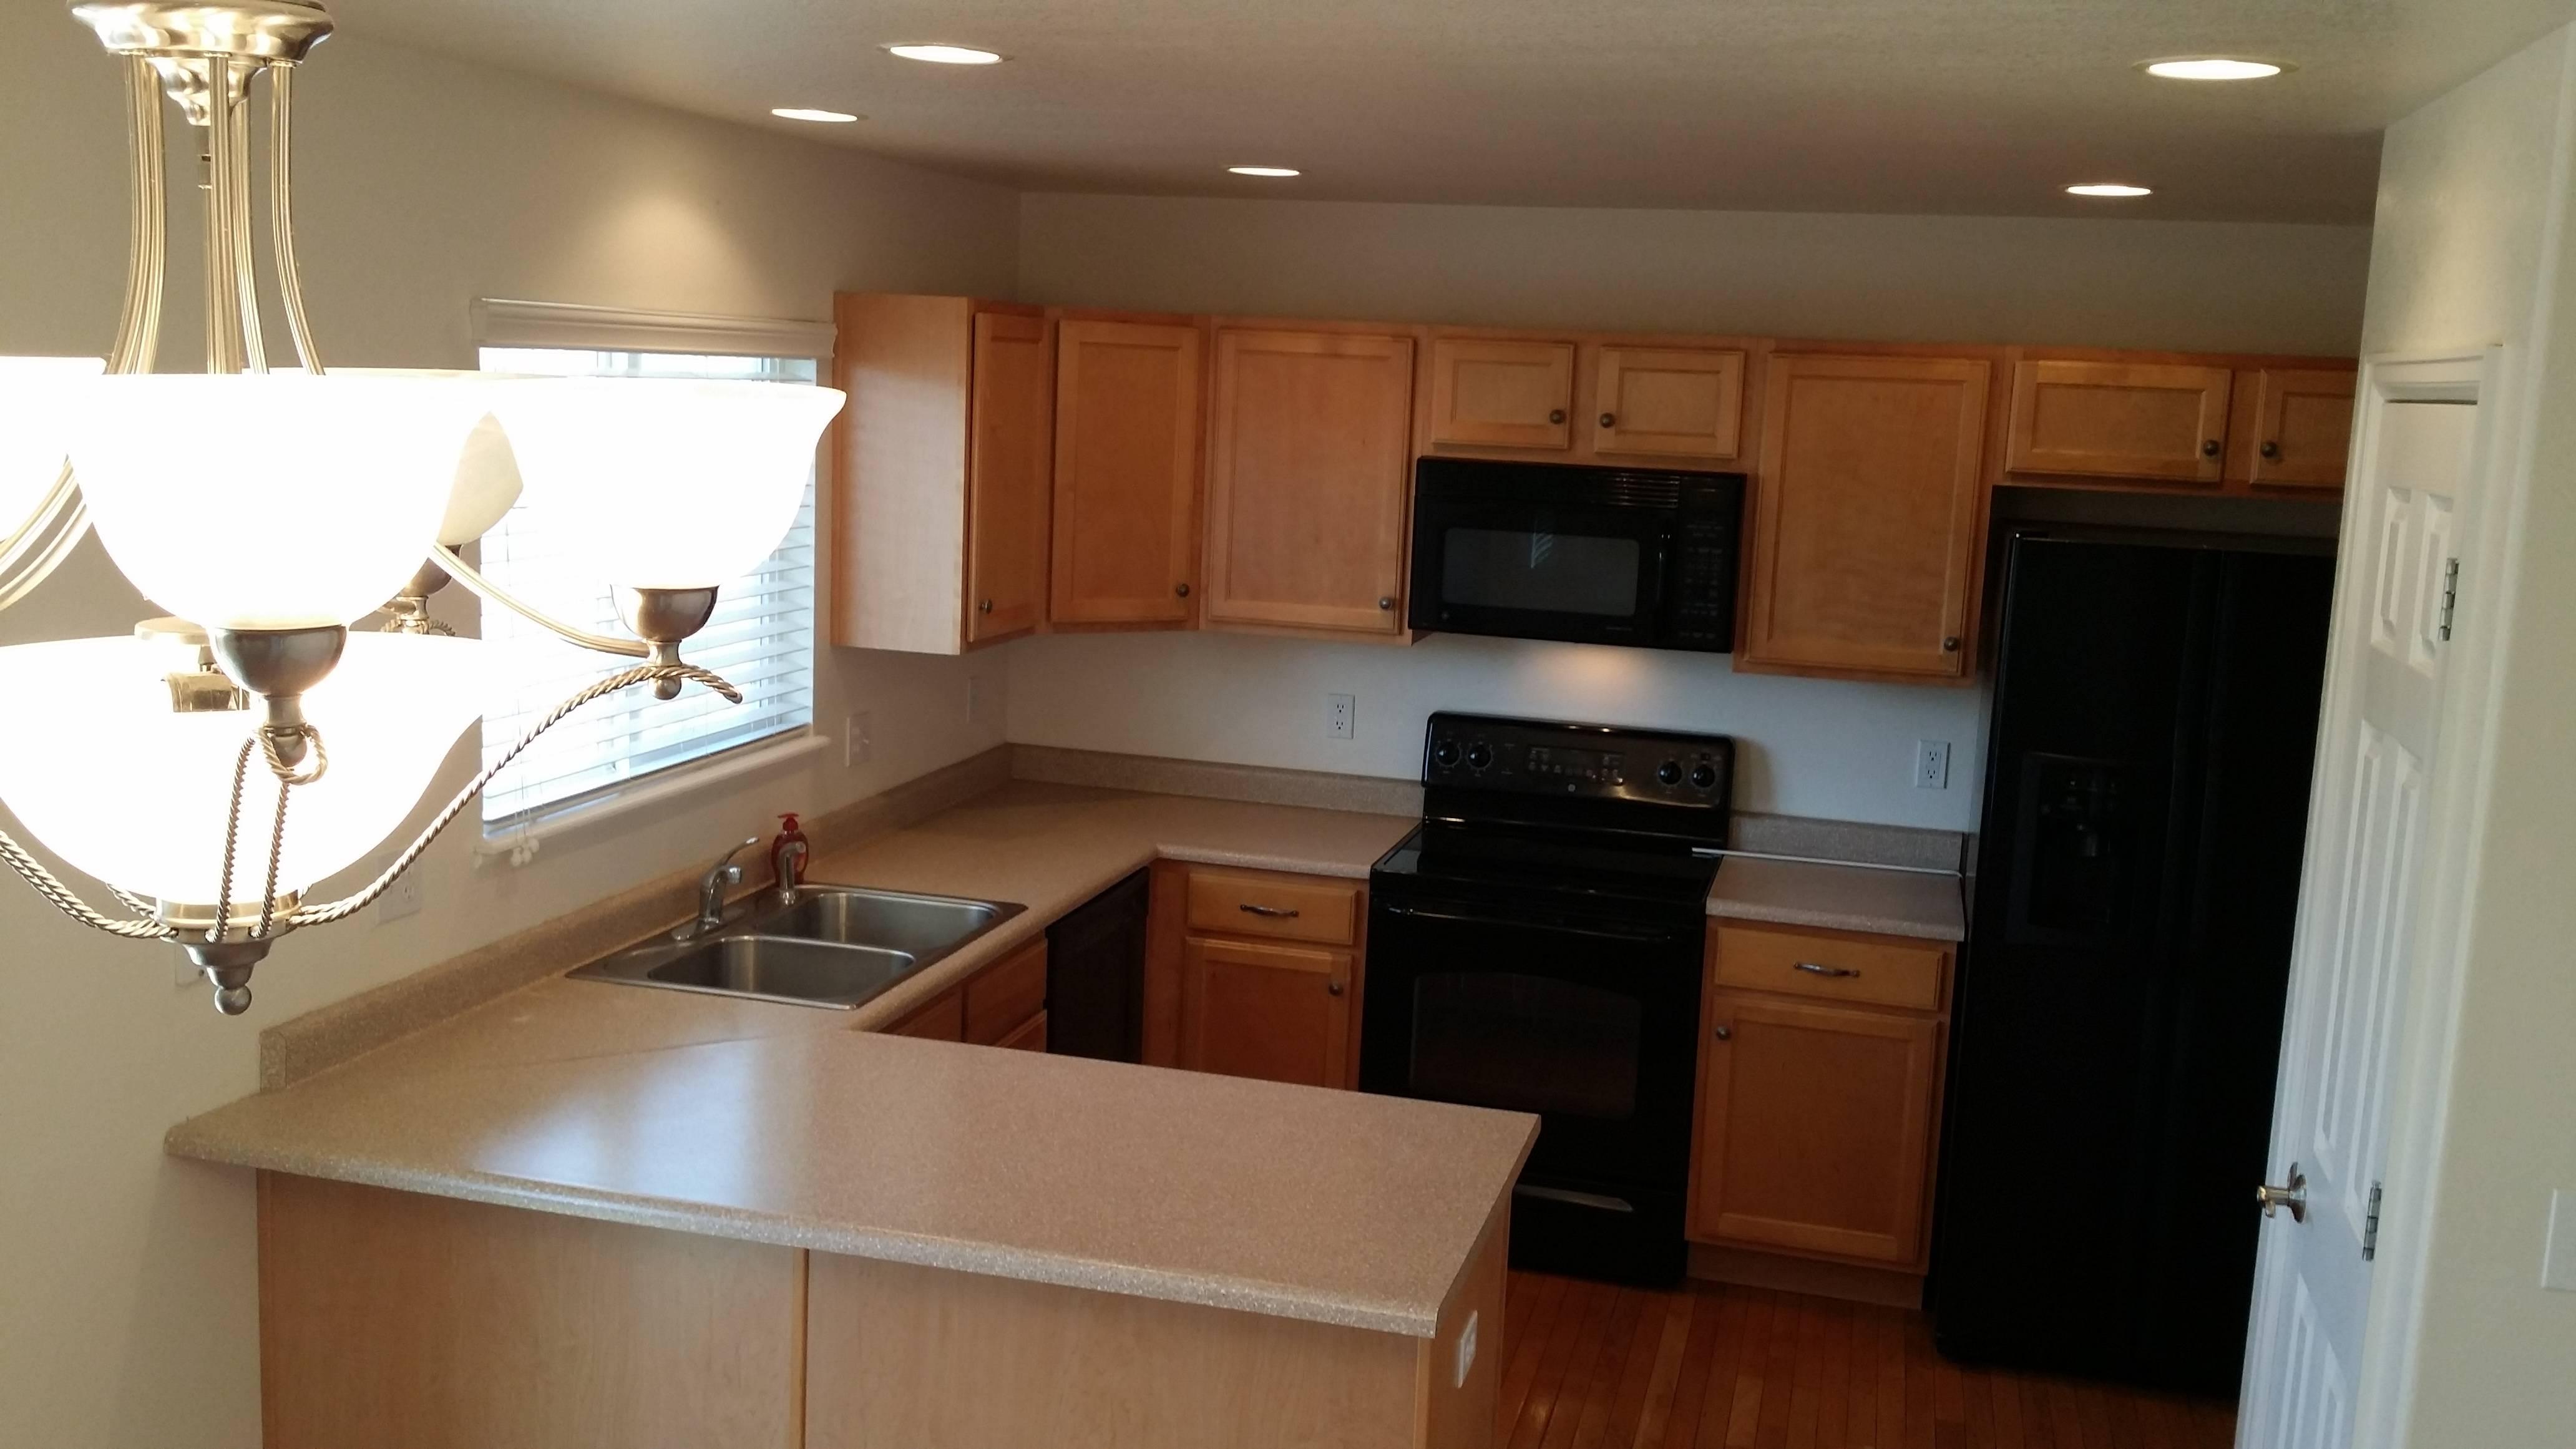 Kitchen And Bath Colorado Springs 3 Bedroom 3 Bath Home Near Fort Carson In Colorado Spri